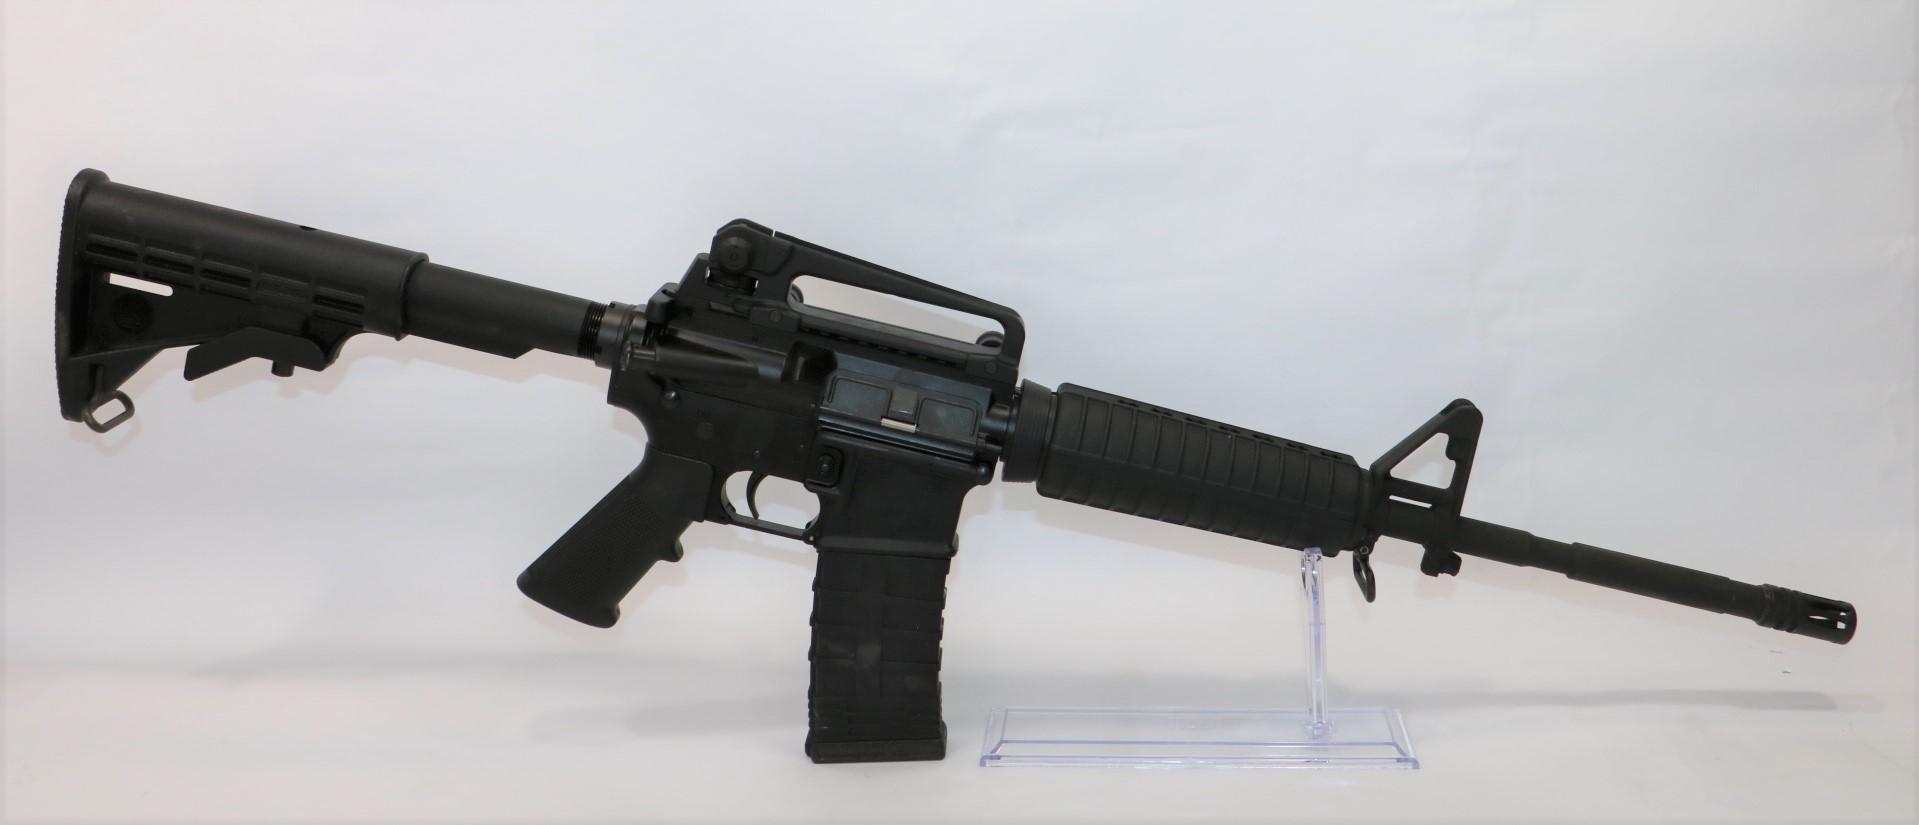 Bushmaster XM15-E2S 5.56/.223 AR15 - No Box-img-1